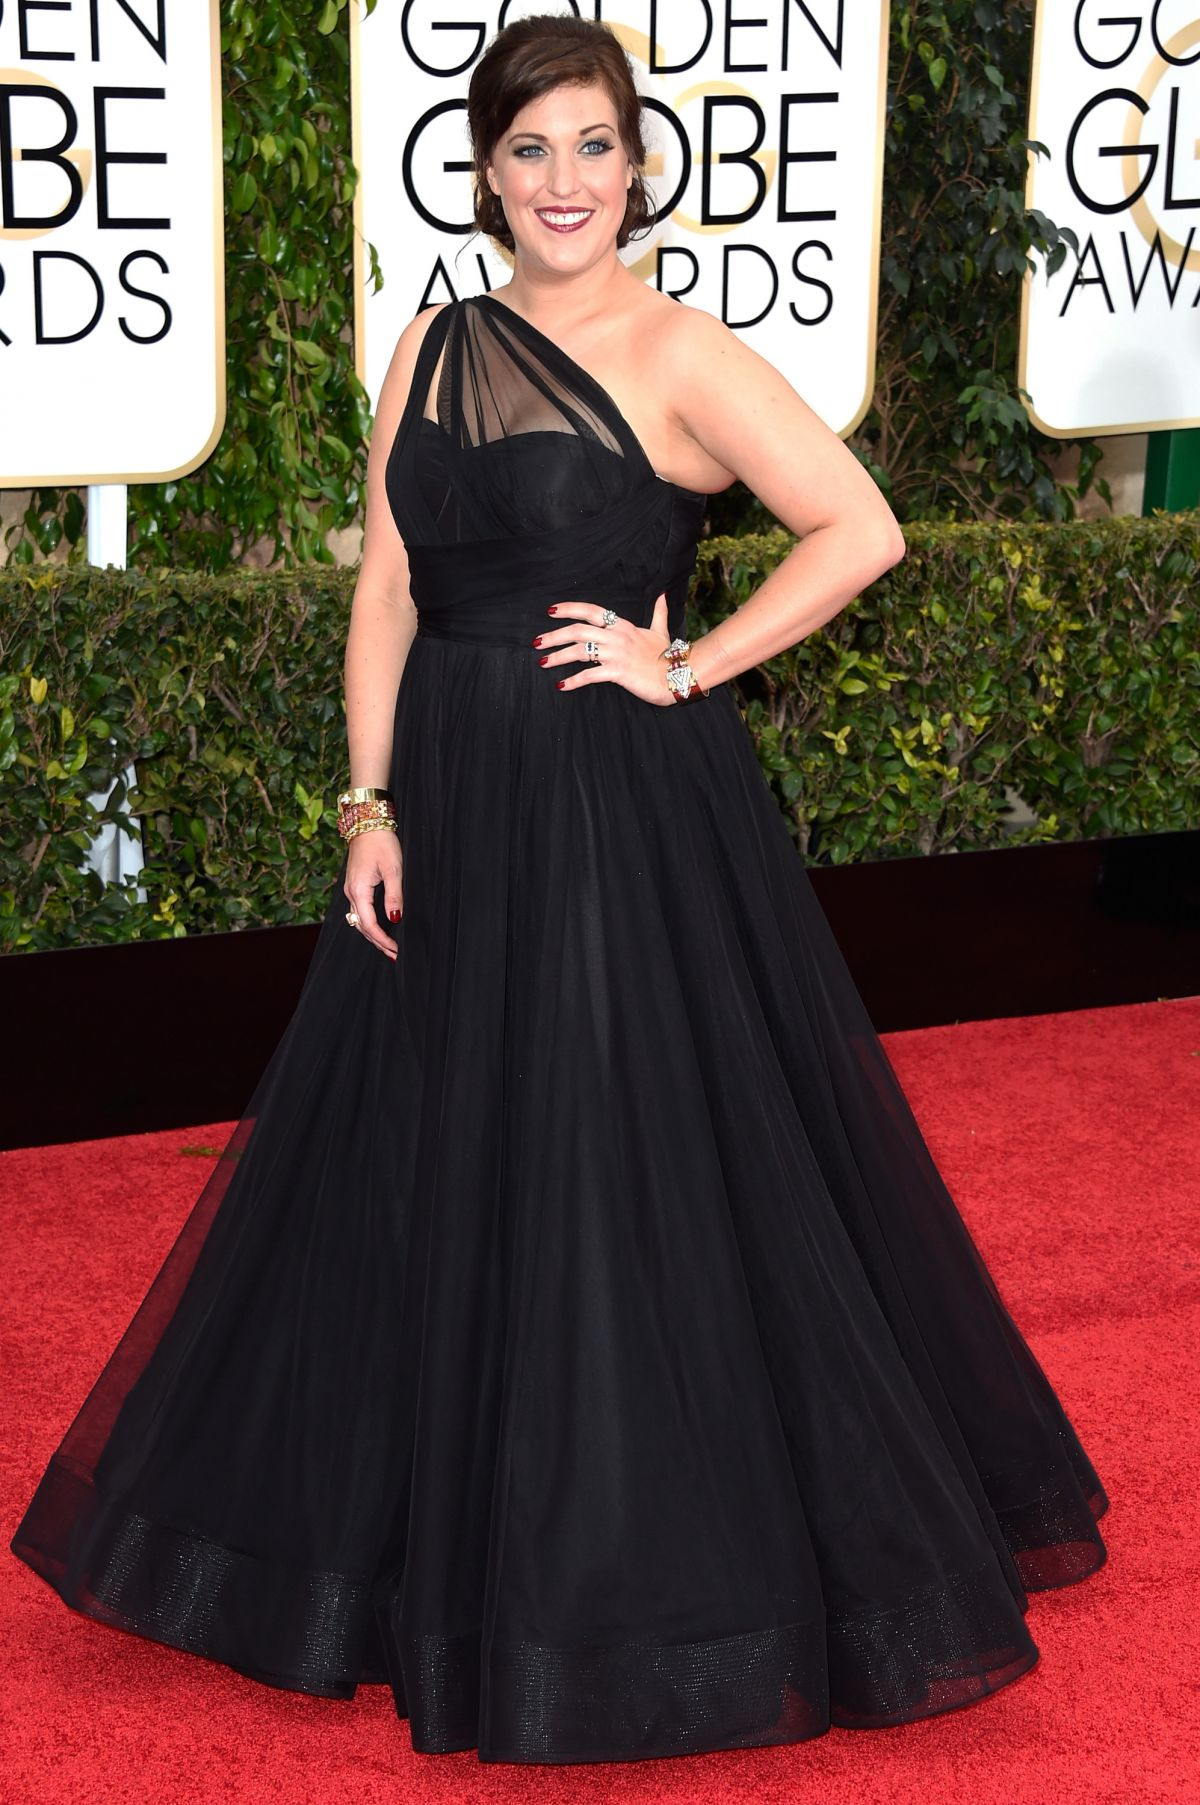 ALLISON TOLMAN at 2015 Golden Globe Awards in Beverly Hills